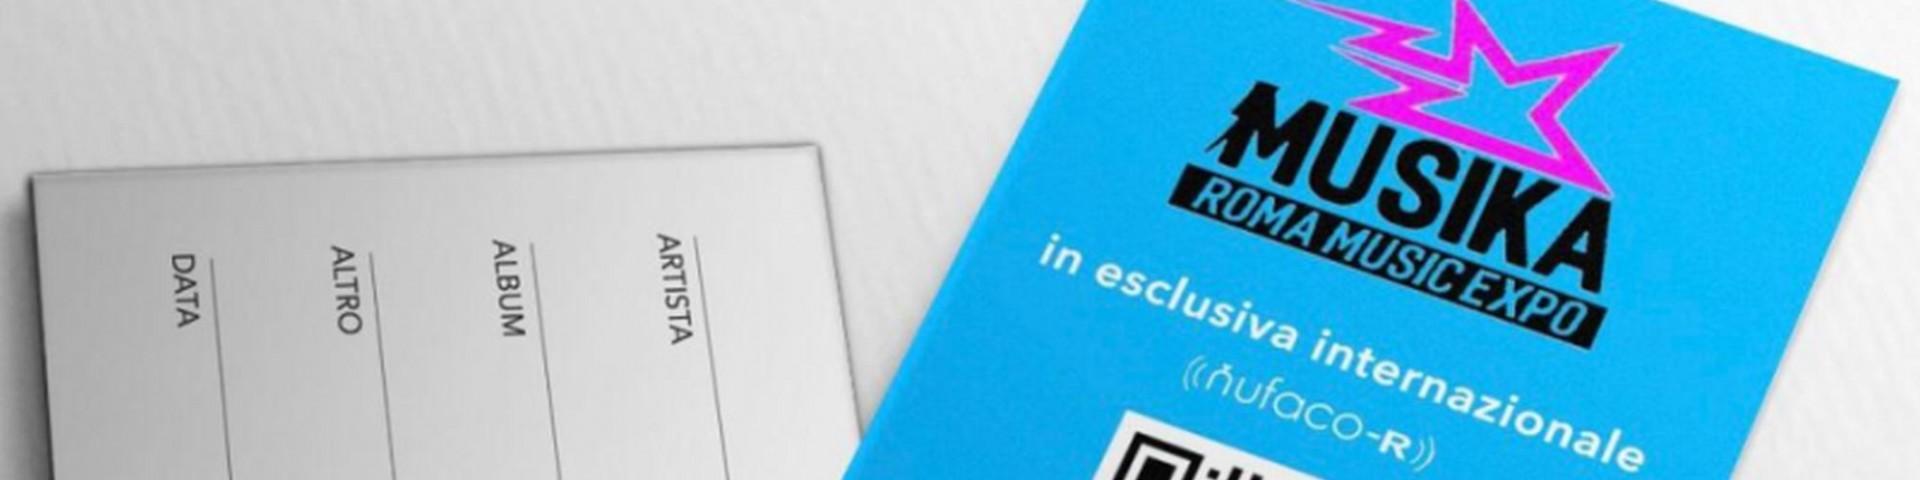 Nufaco presenta la card vuota a Expo Musika a Roma